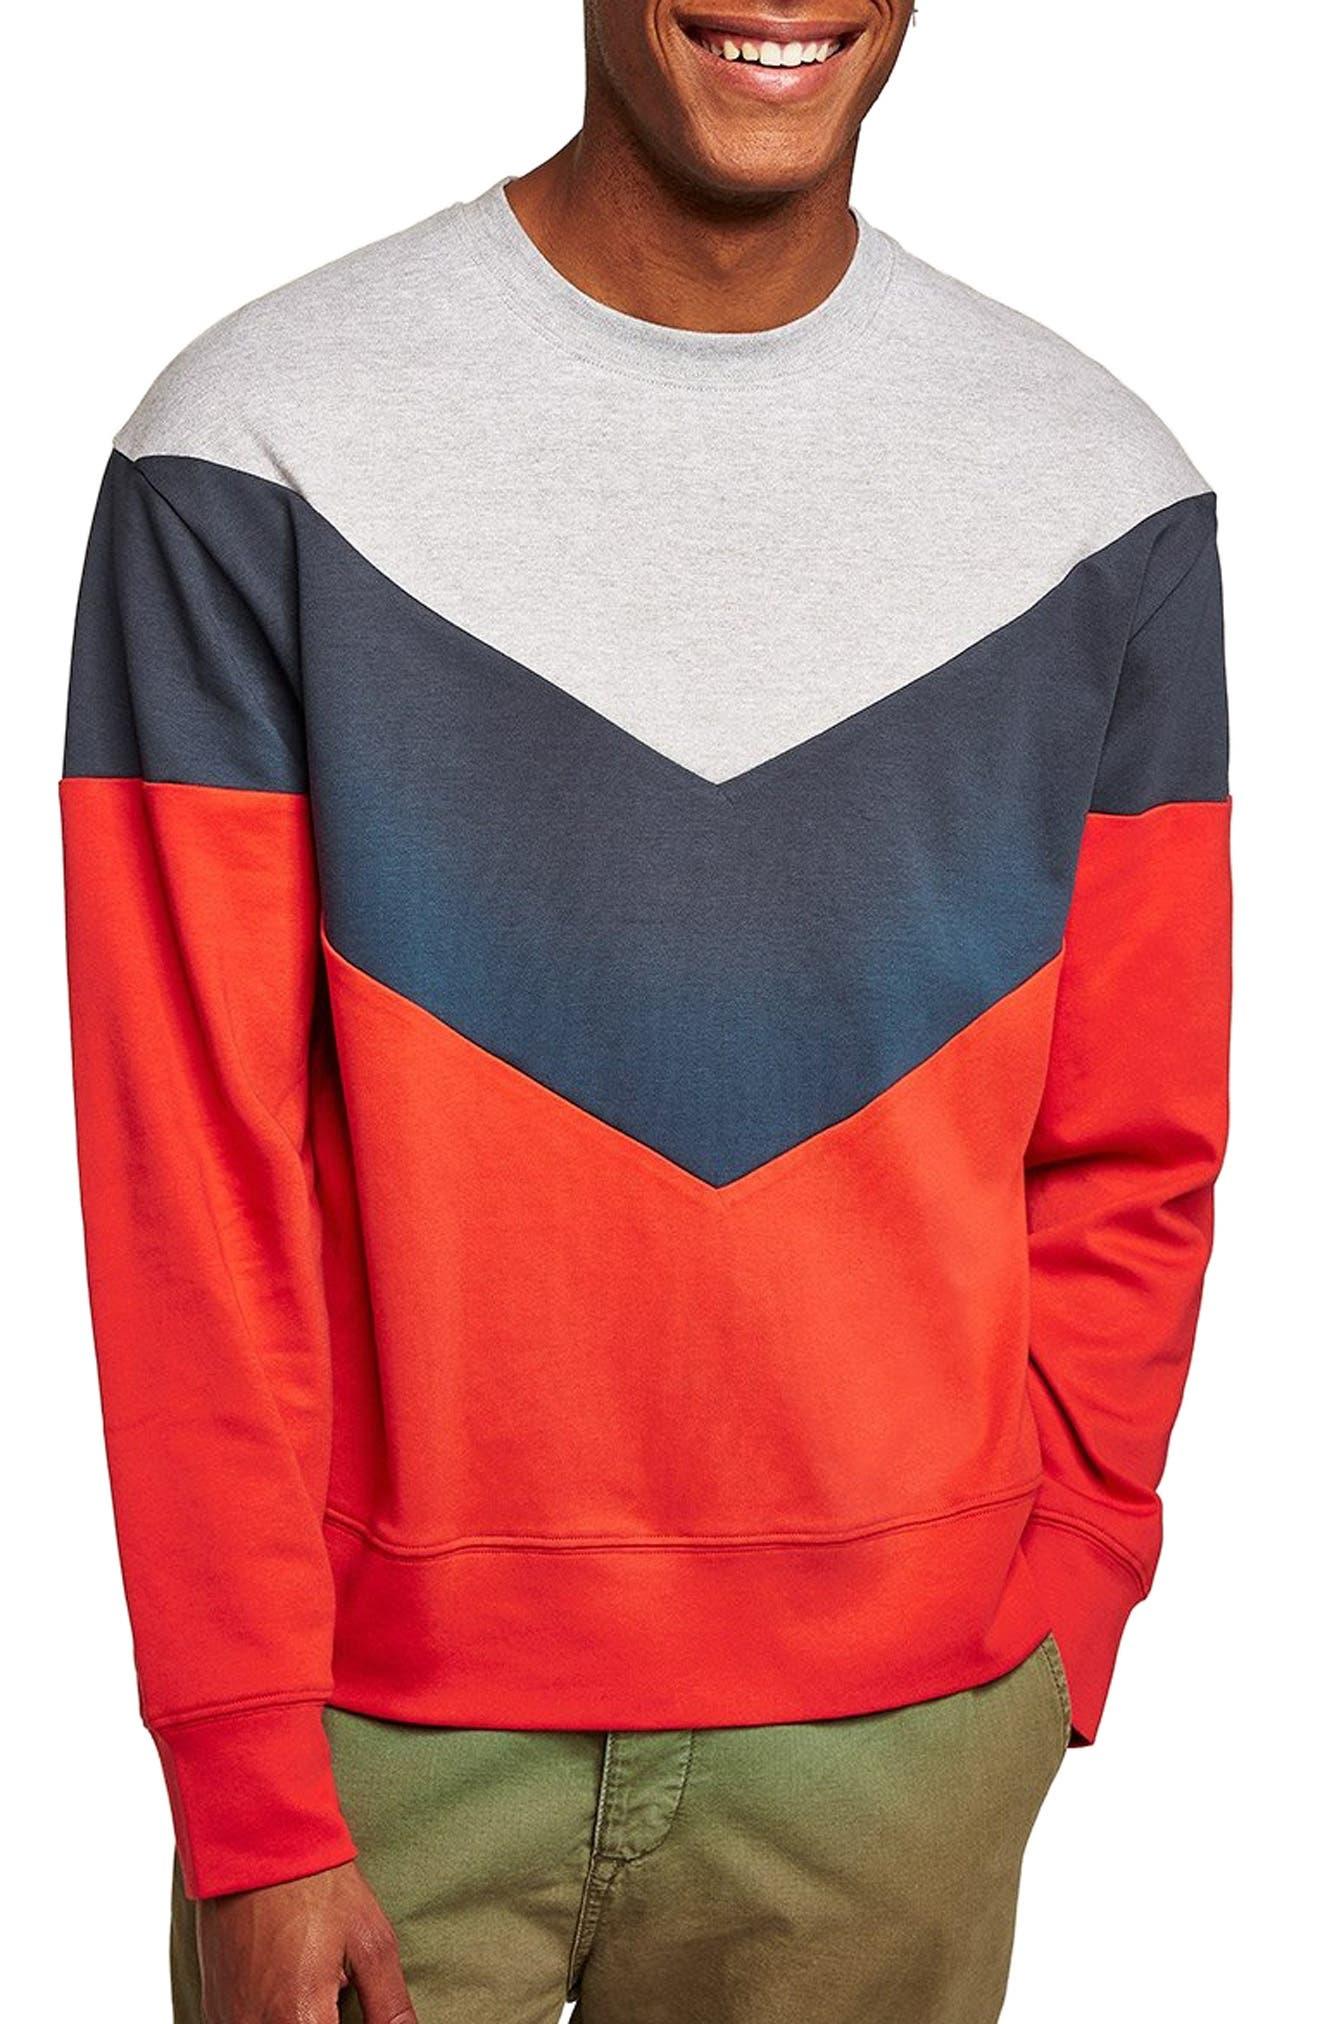 Chevron Colorblock Sweatshirt,                         Main,                         color, RED MULTI